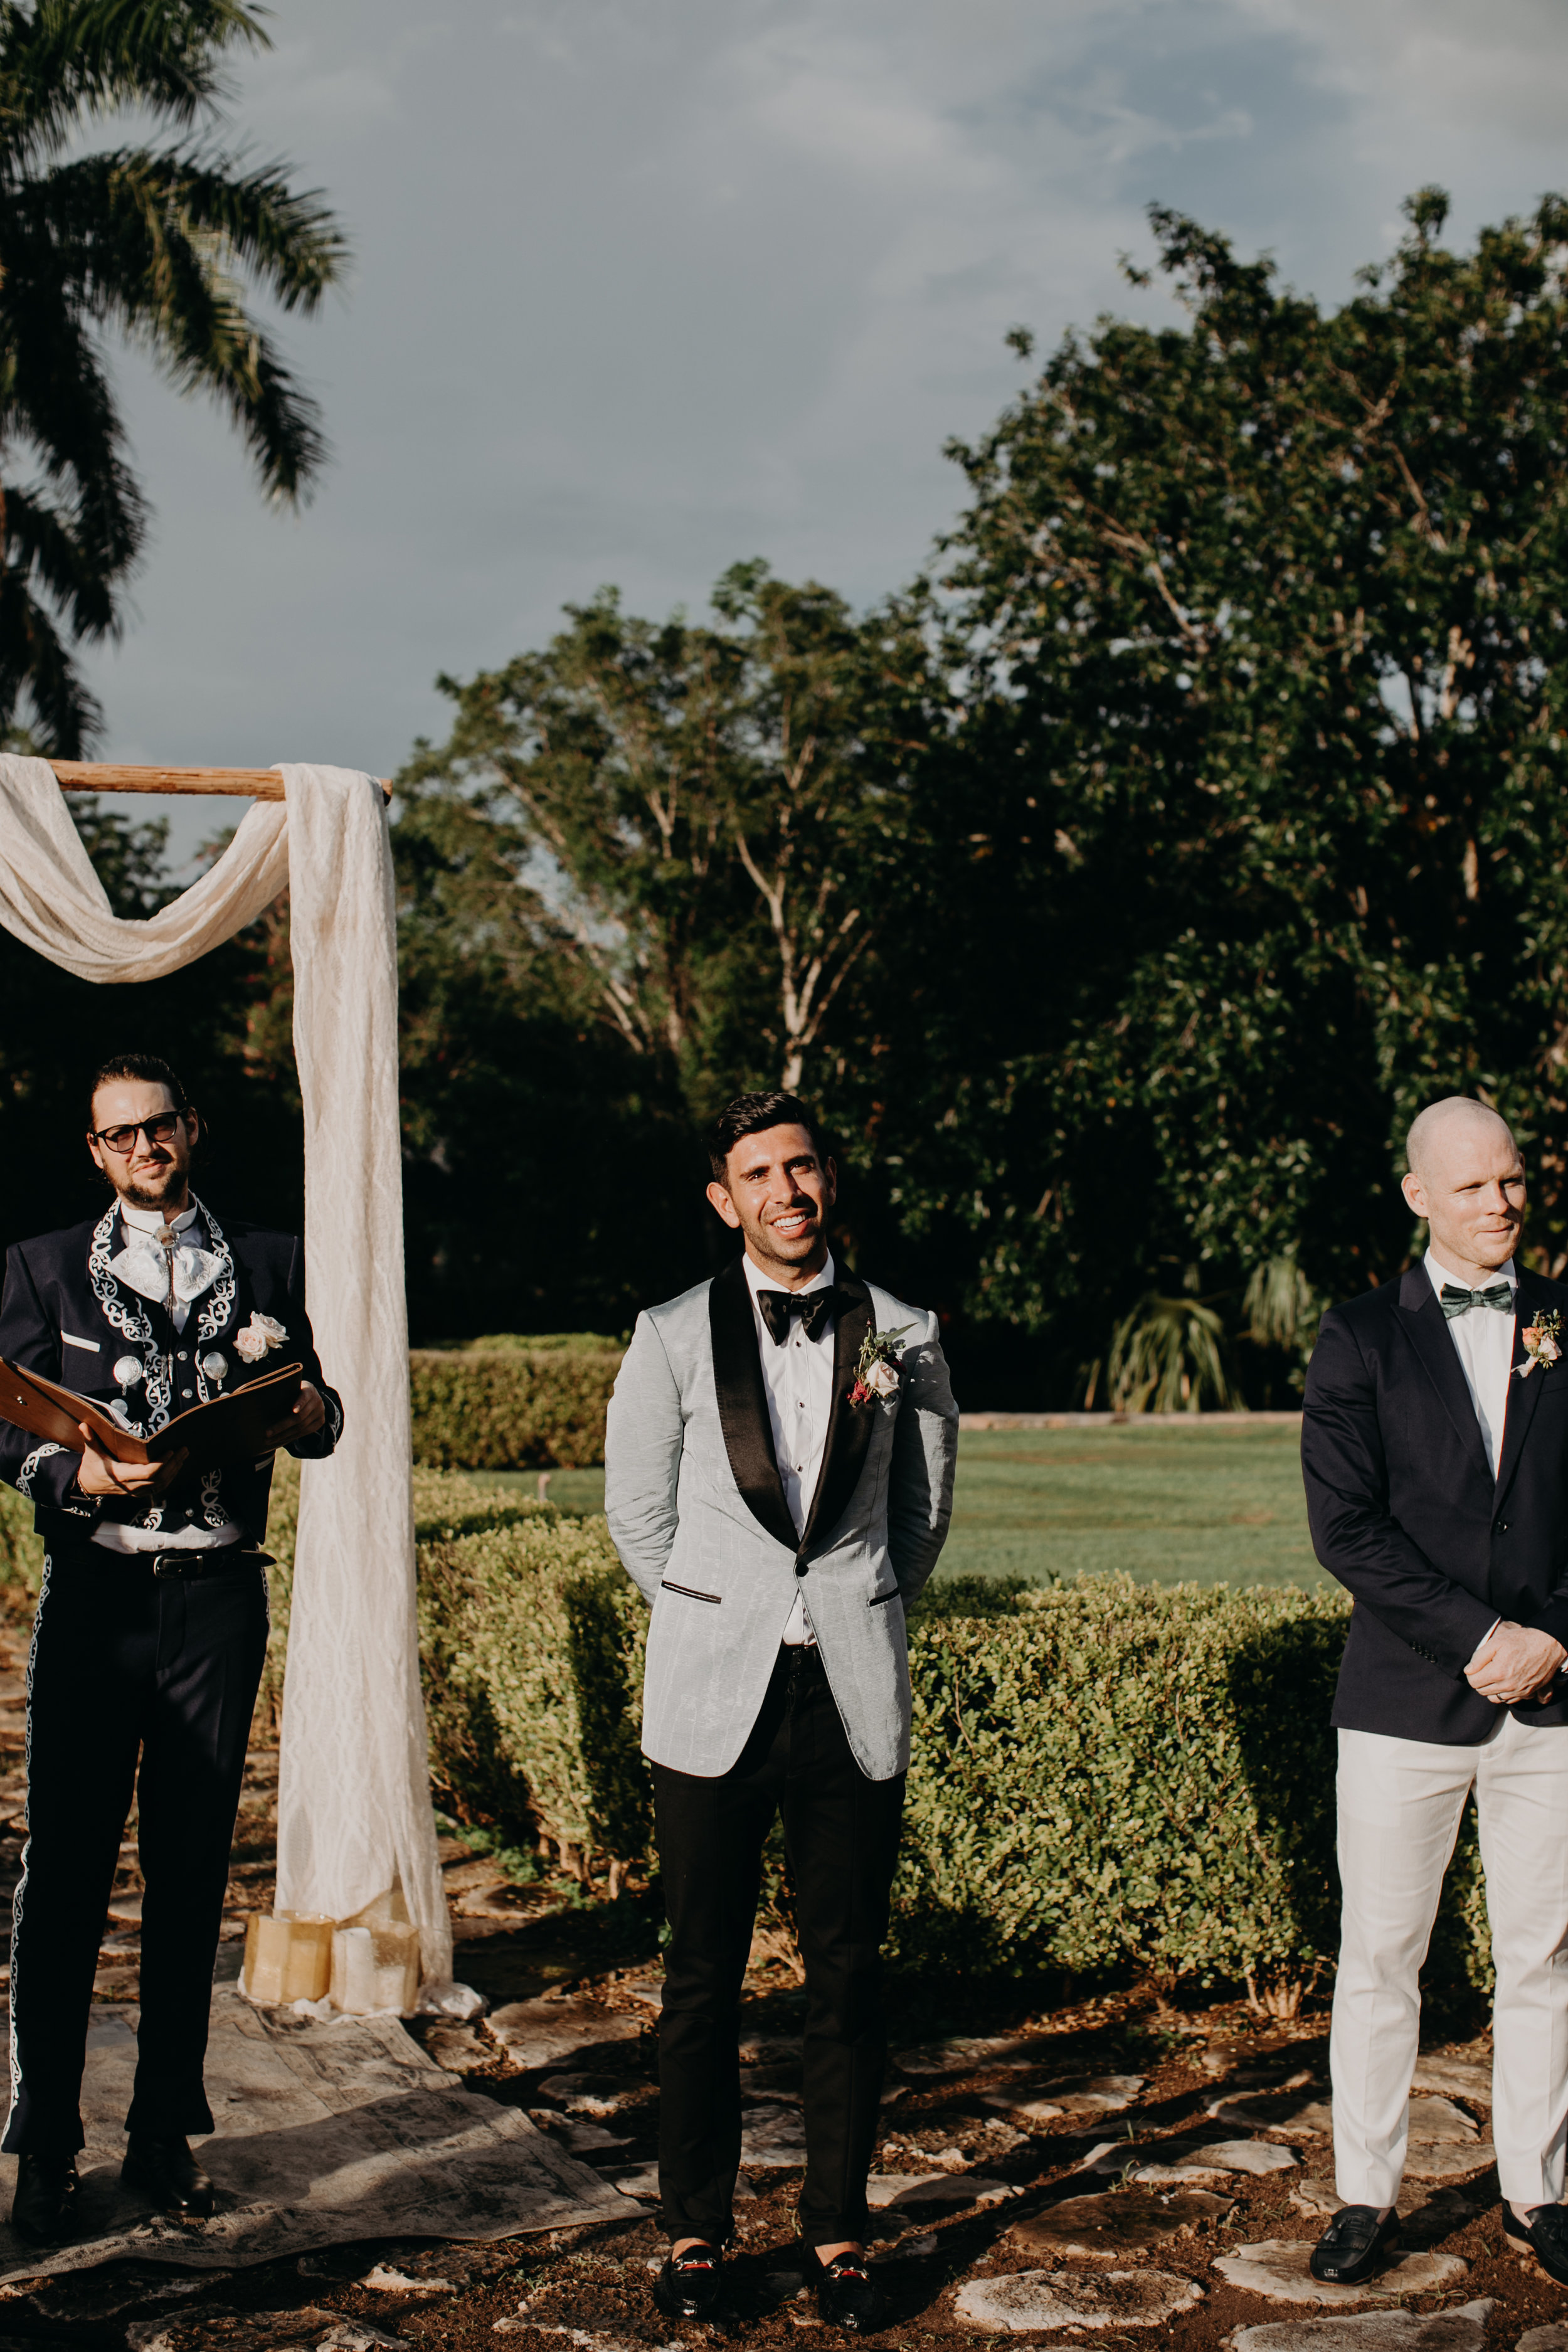 Hacienda Temozon Yucatan Mexico Wedding | Ida & Peter Emily Magers Photography-989.jpg